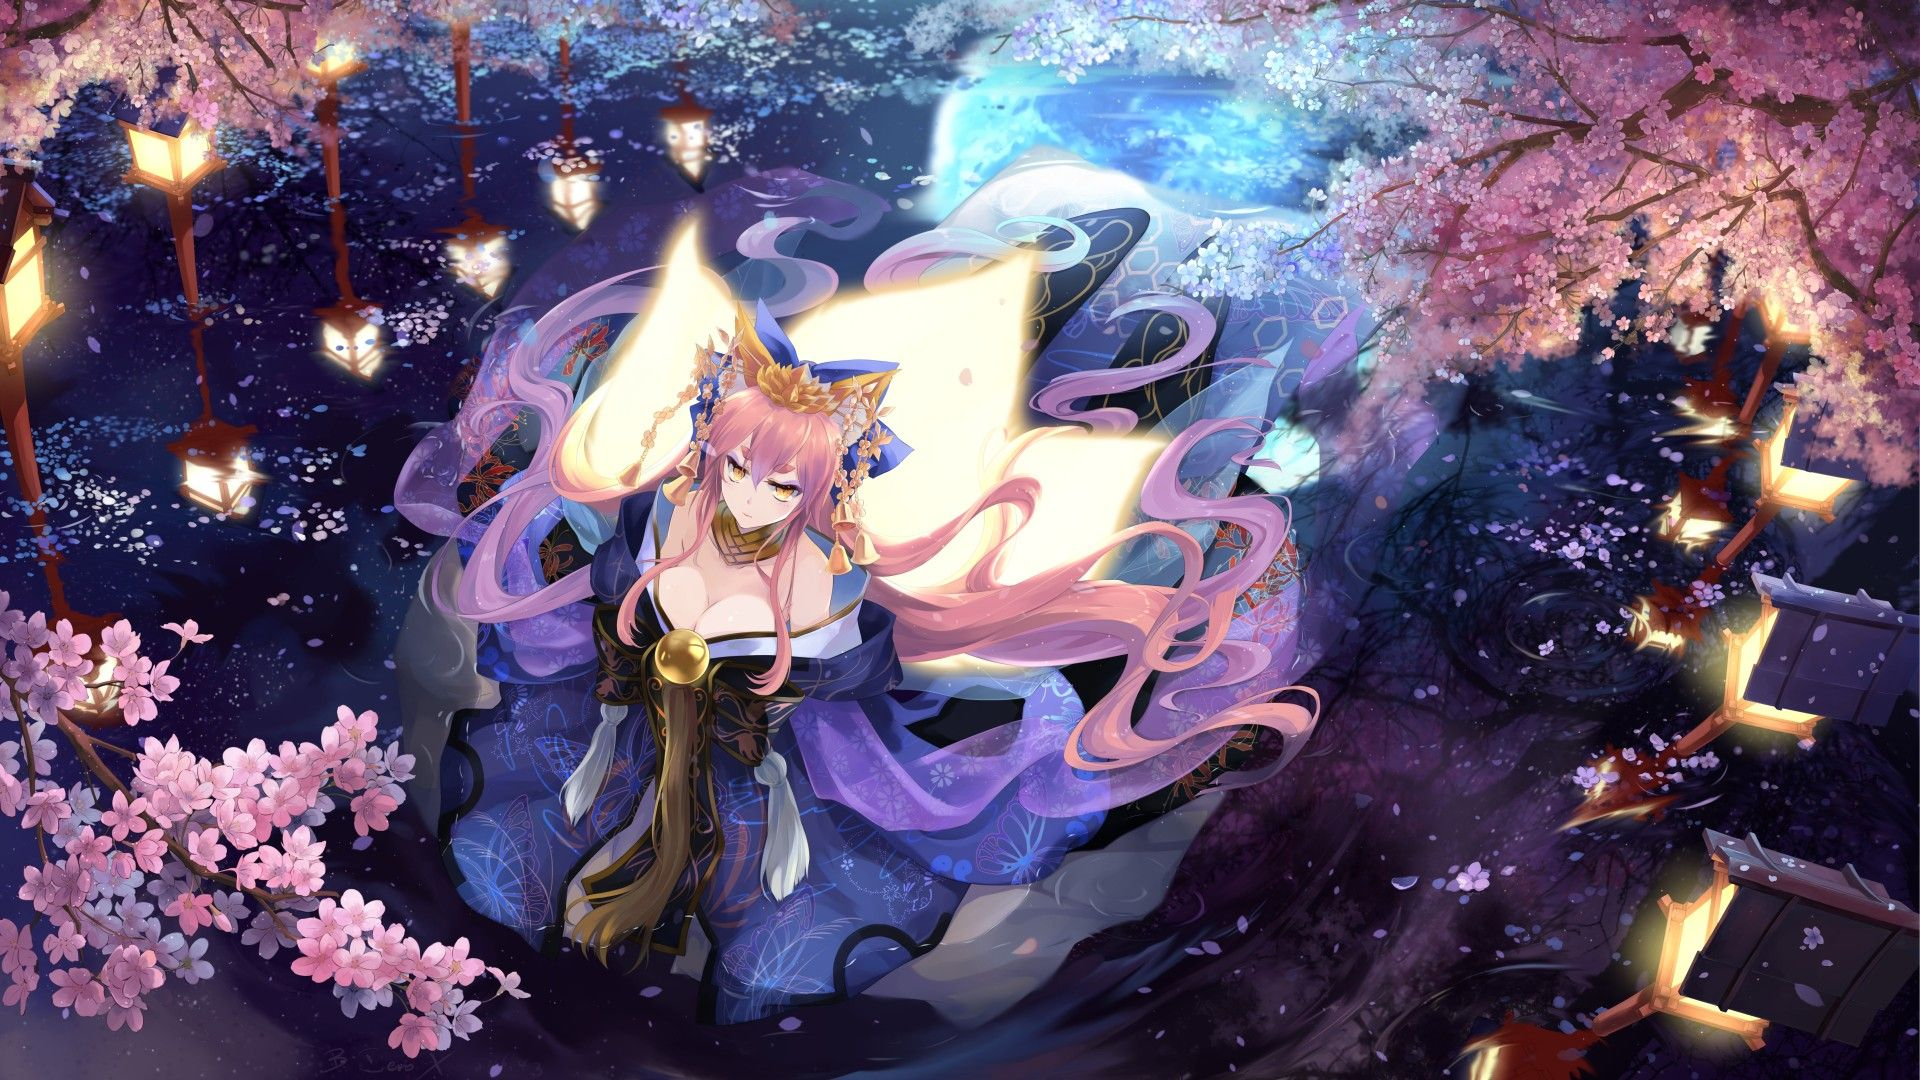 Anime 1920x1080 Caster Fate Extra Fate Series Caster Fate